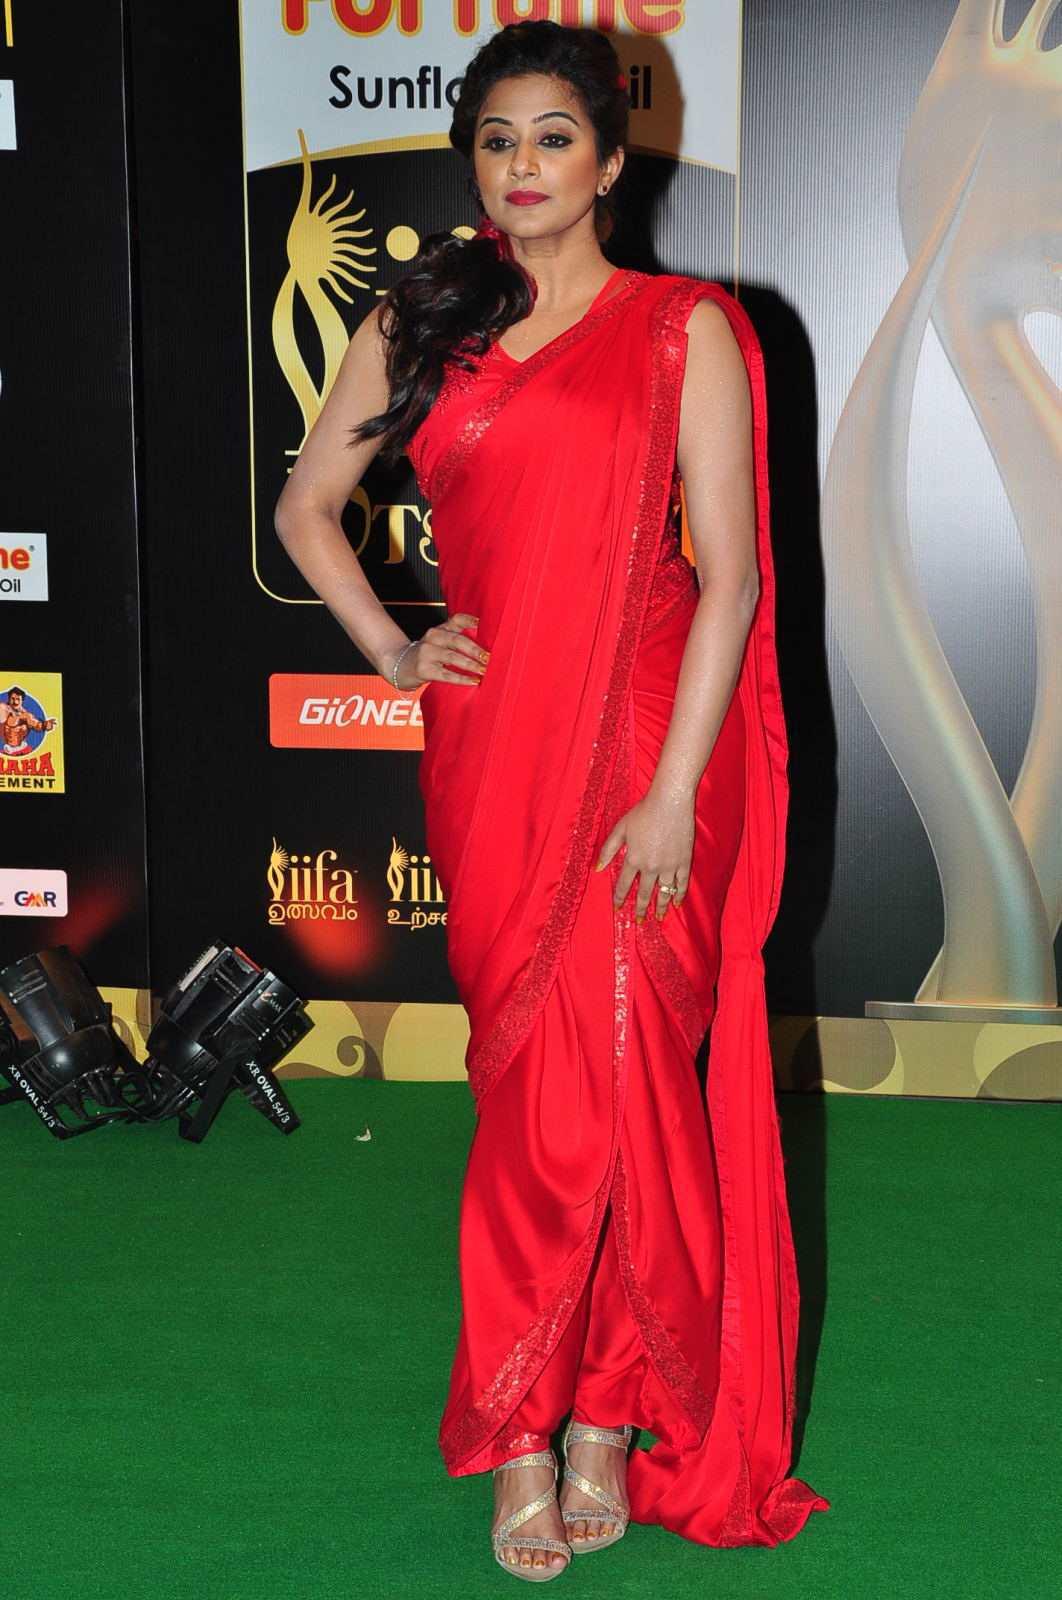 Priyamani latest hot stills priyamani latest hot photos images pics - South Indian Actress Priyamani Latest Exclusive Spicy Photos Gallery At Iifa Awards